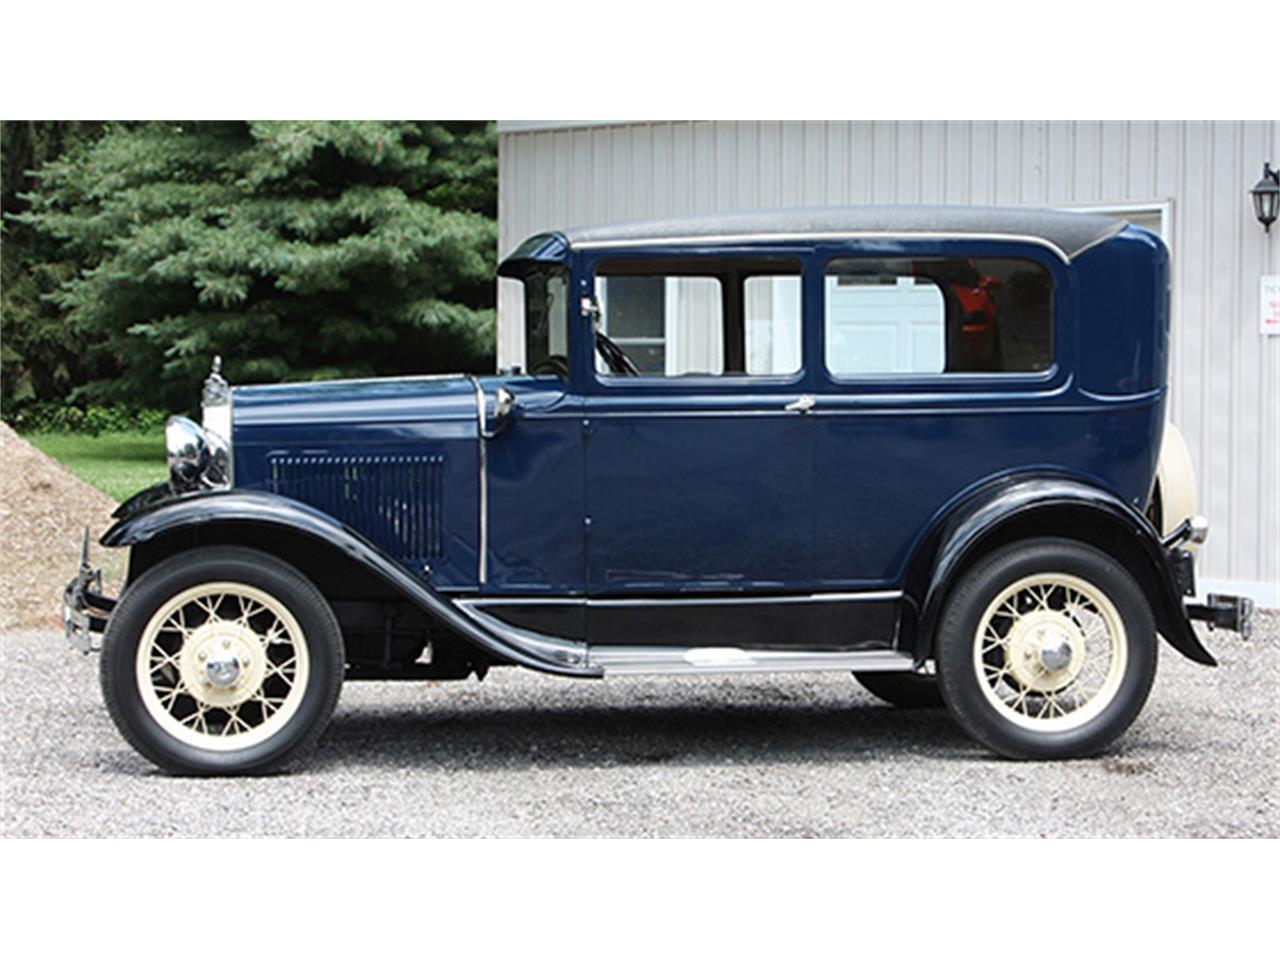 Ford Model A Tudor 1930 for sale at ERclassics